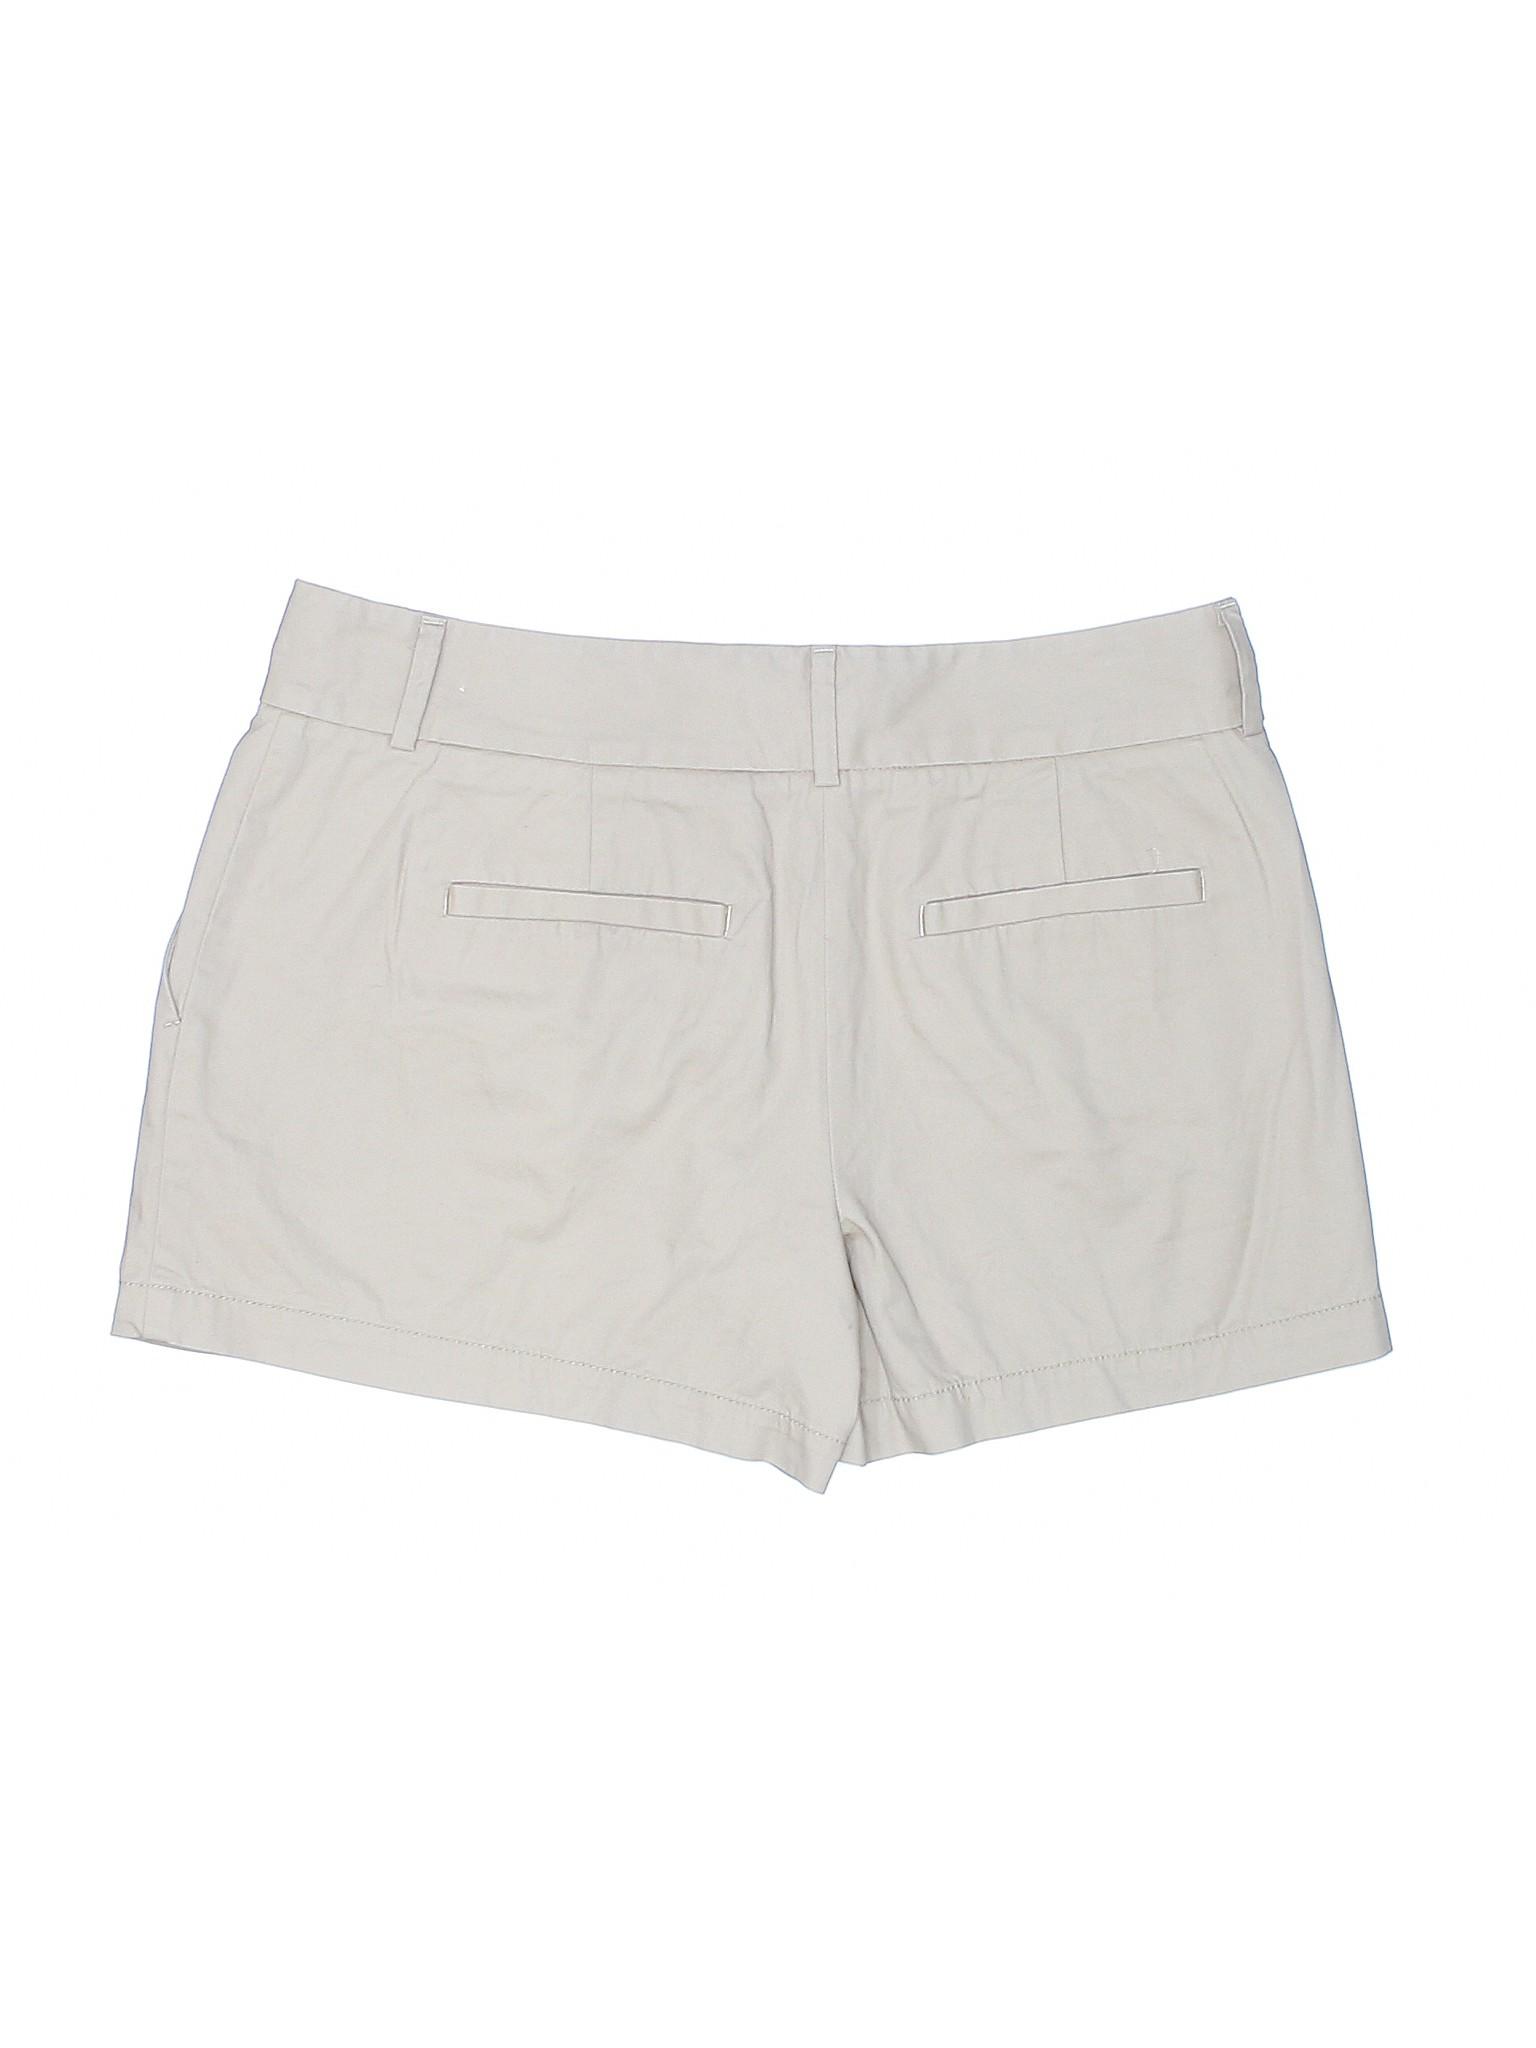 Ann Boutique Taylor leisure Khaki Shorts LOFT xfvwnz85qw